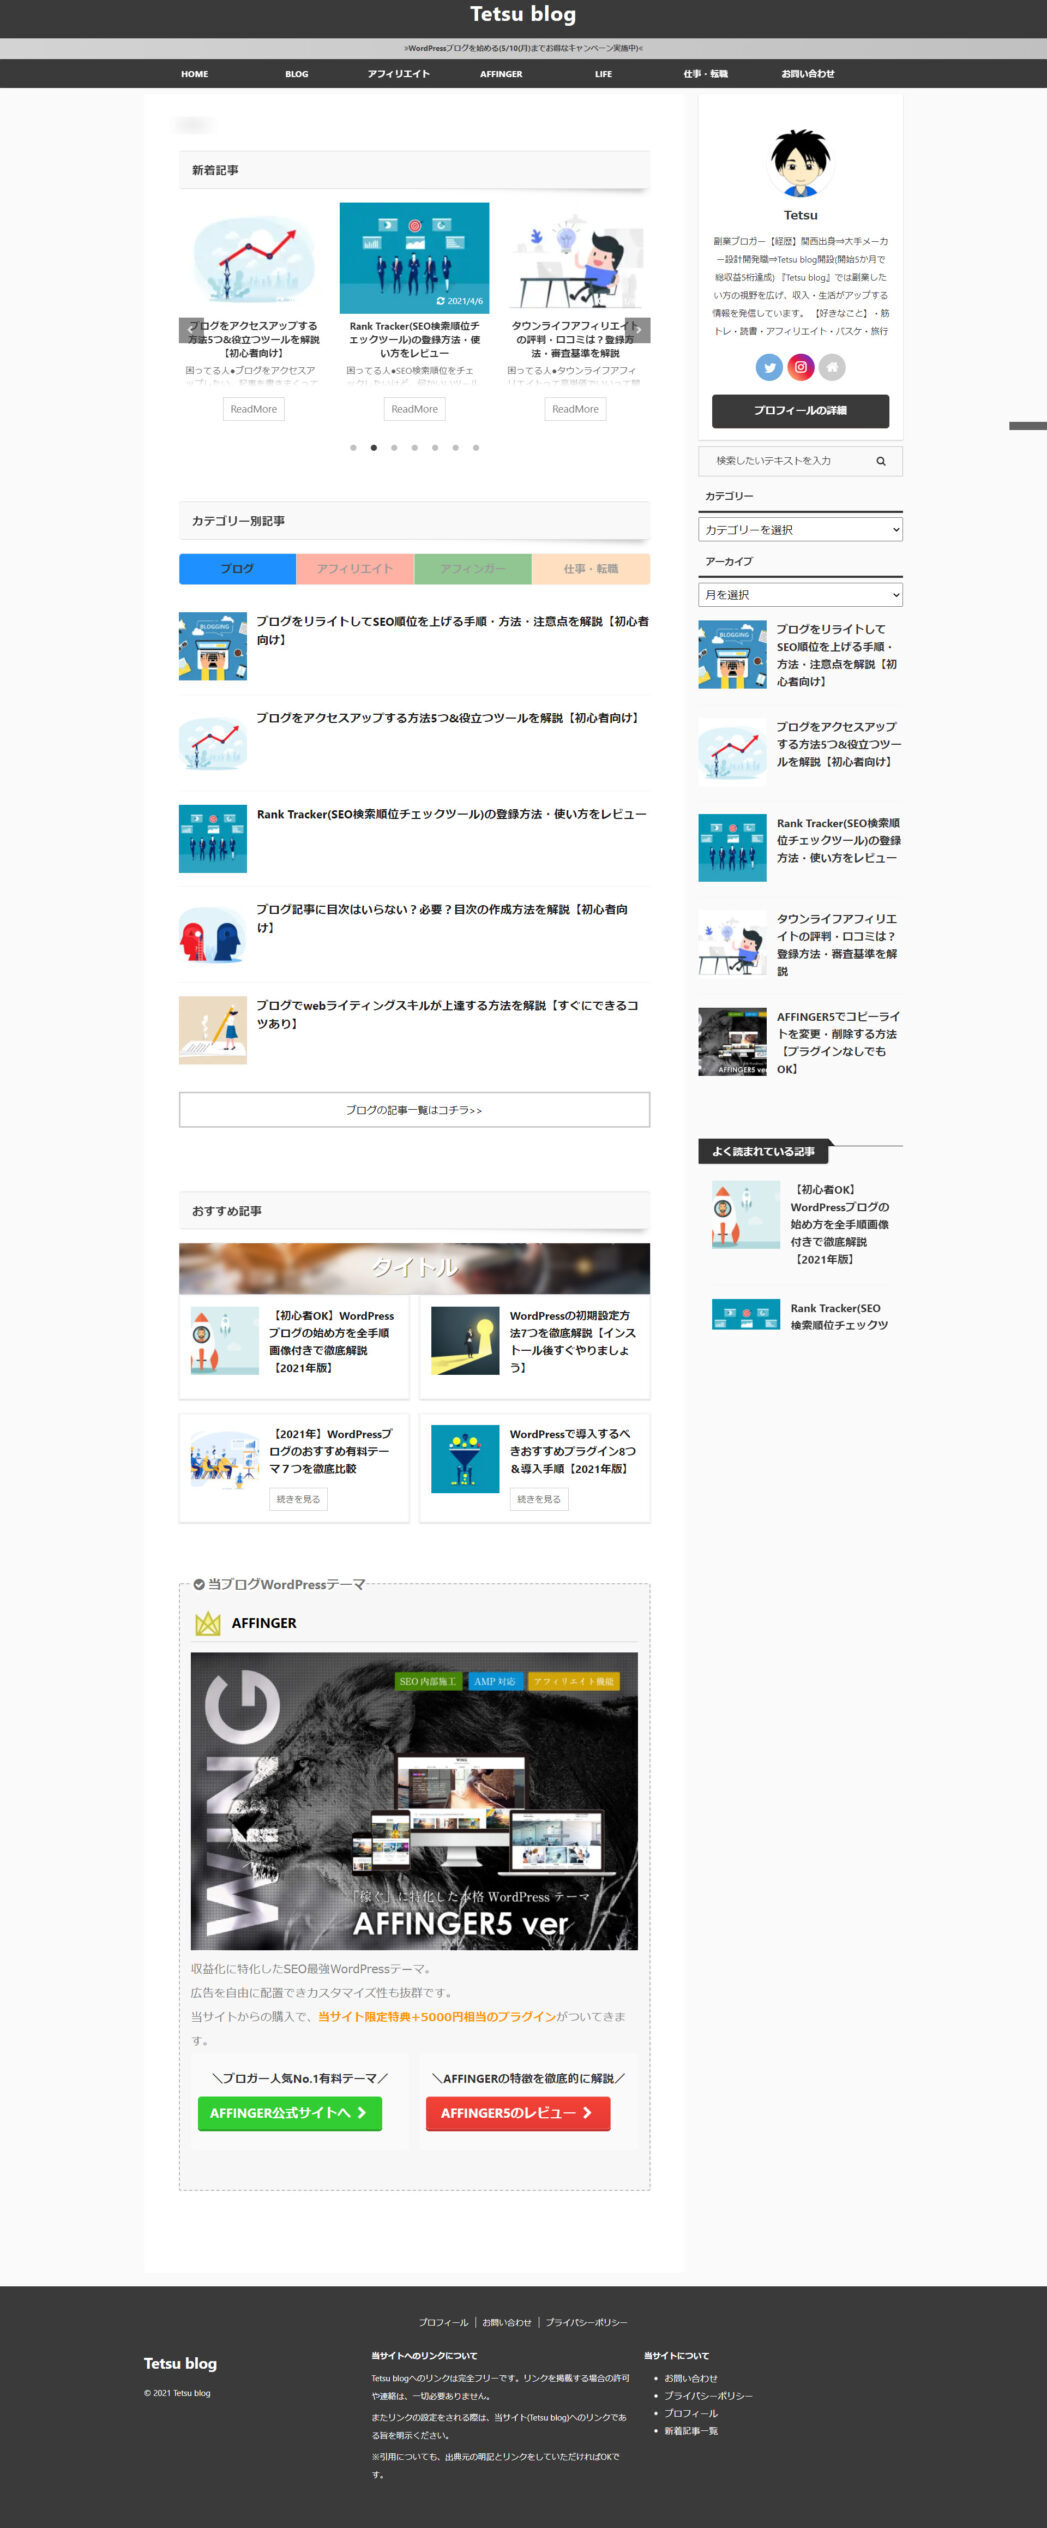 AFFINGER5のトップページカスタマイズ完成例